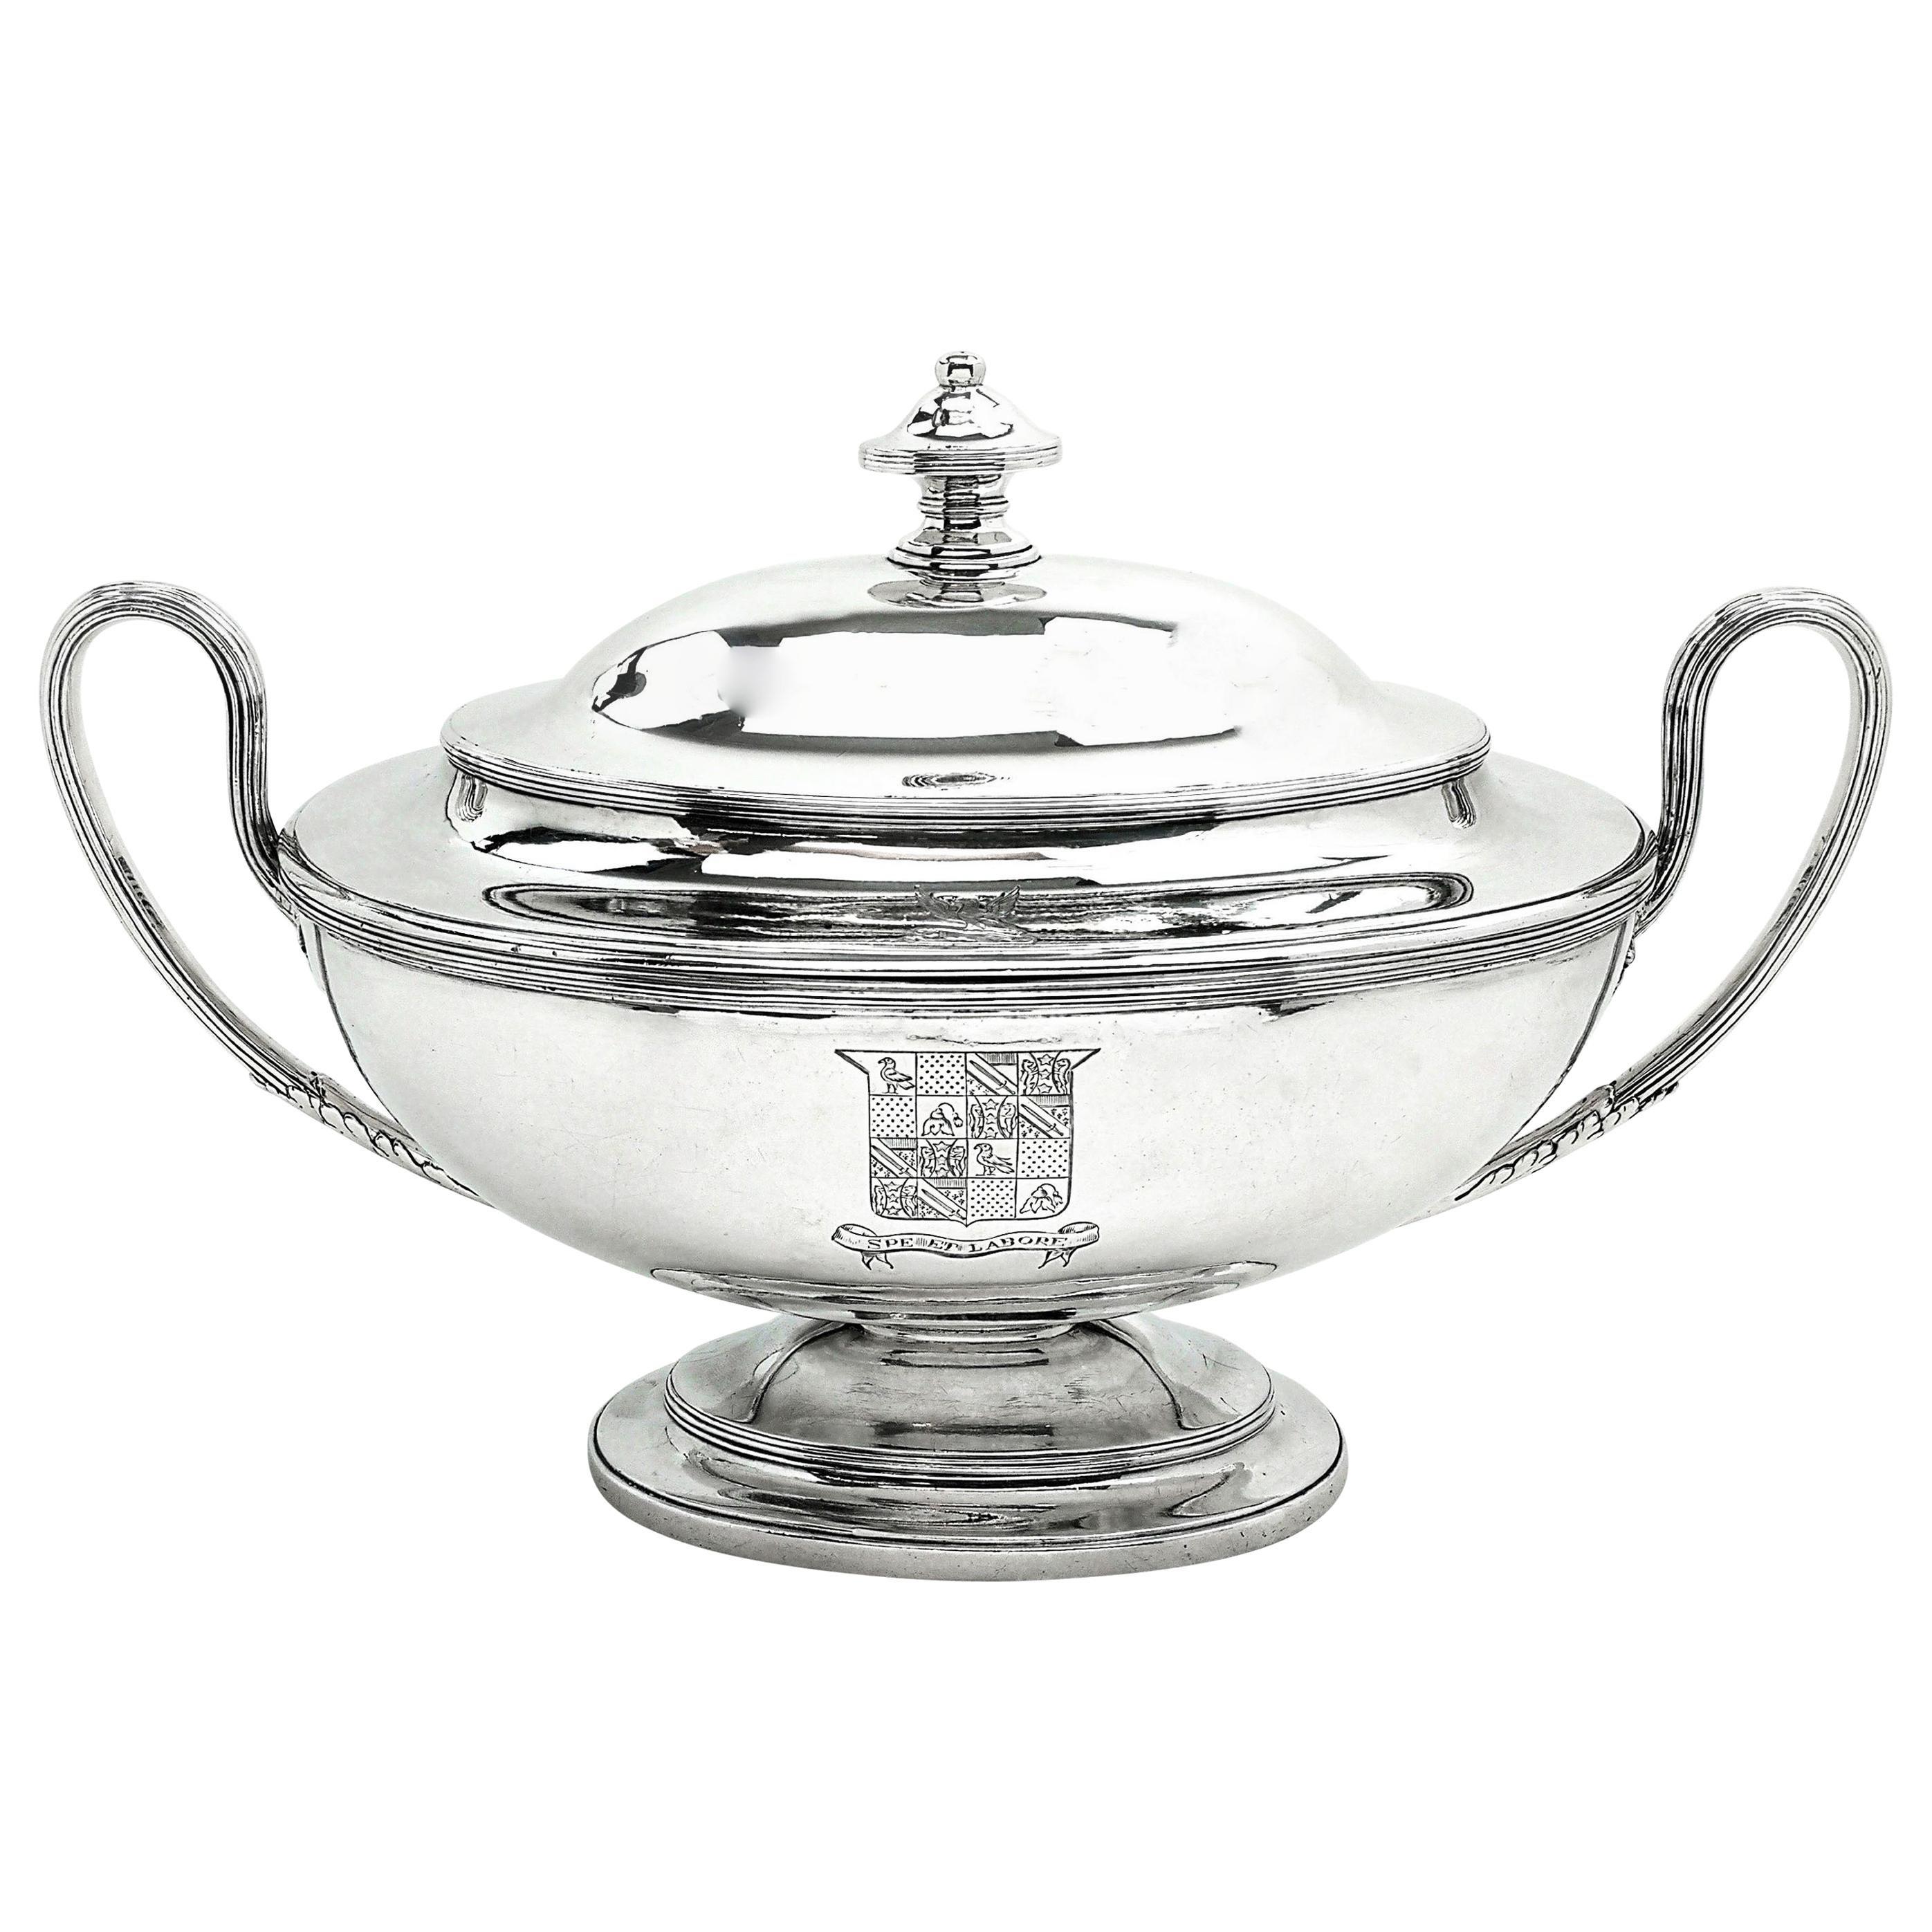 Antique Georgian George III Silver Soup Tureen 1779 Serving Tableware